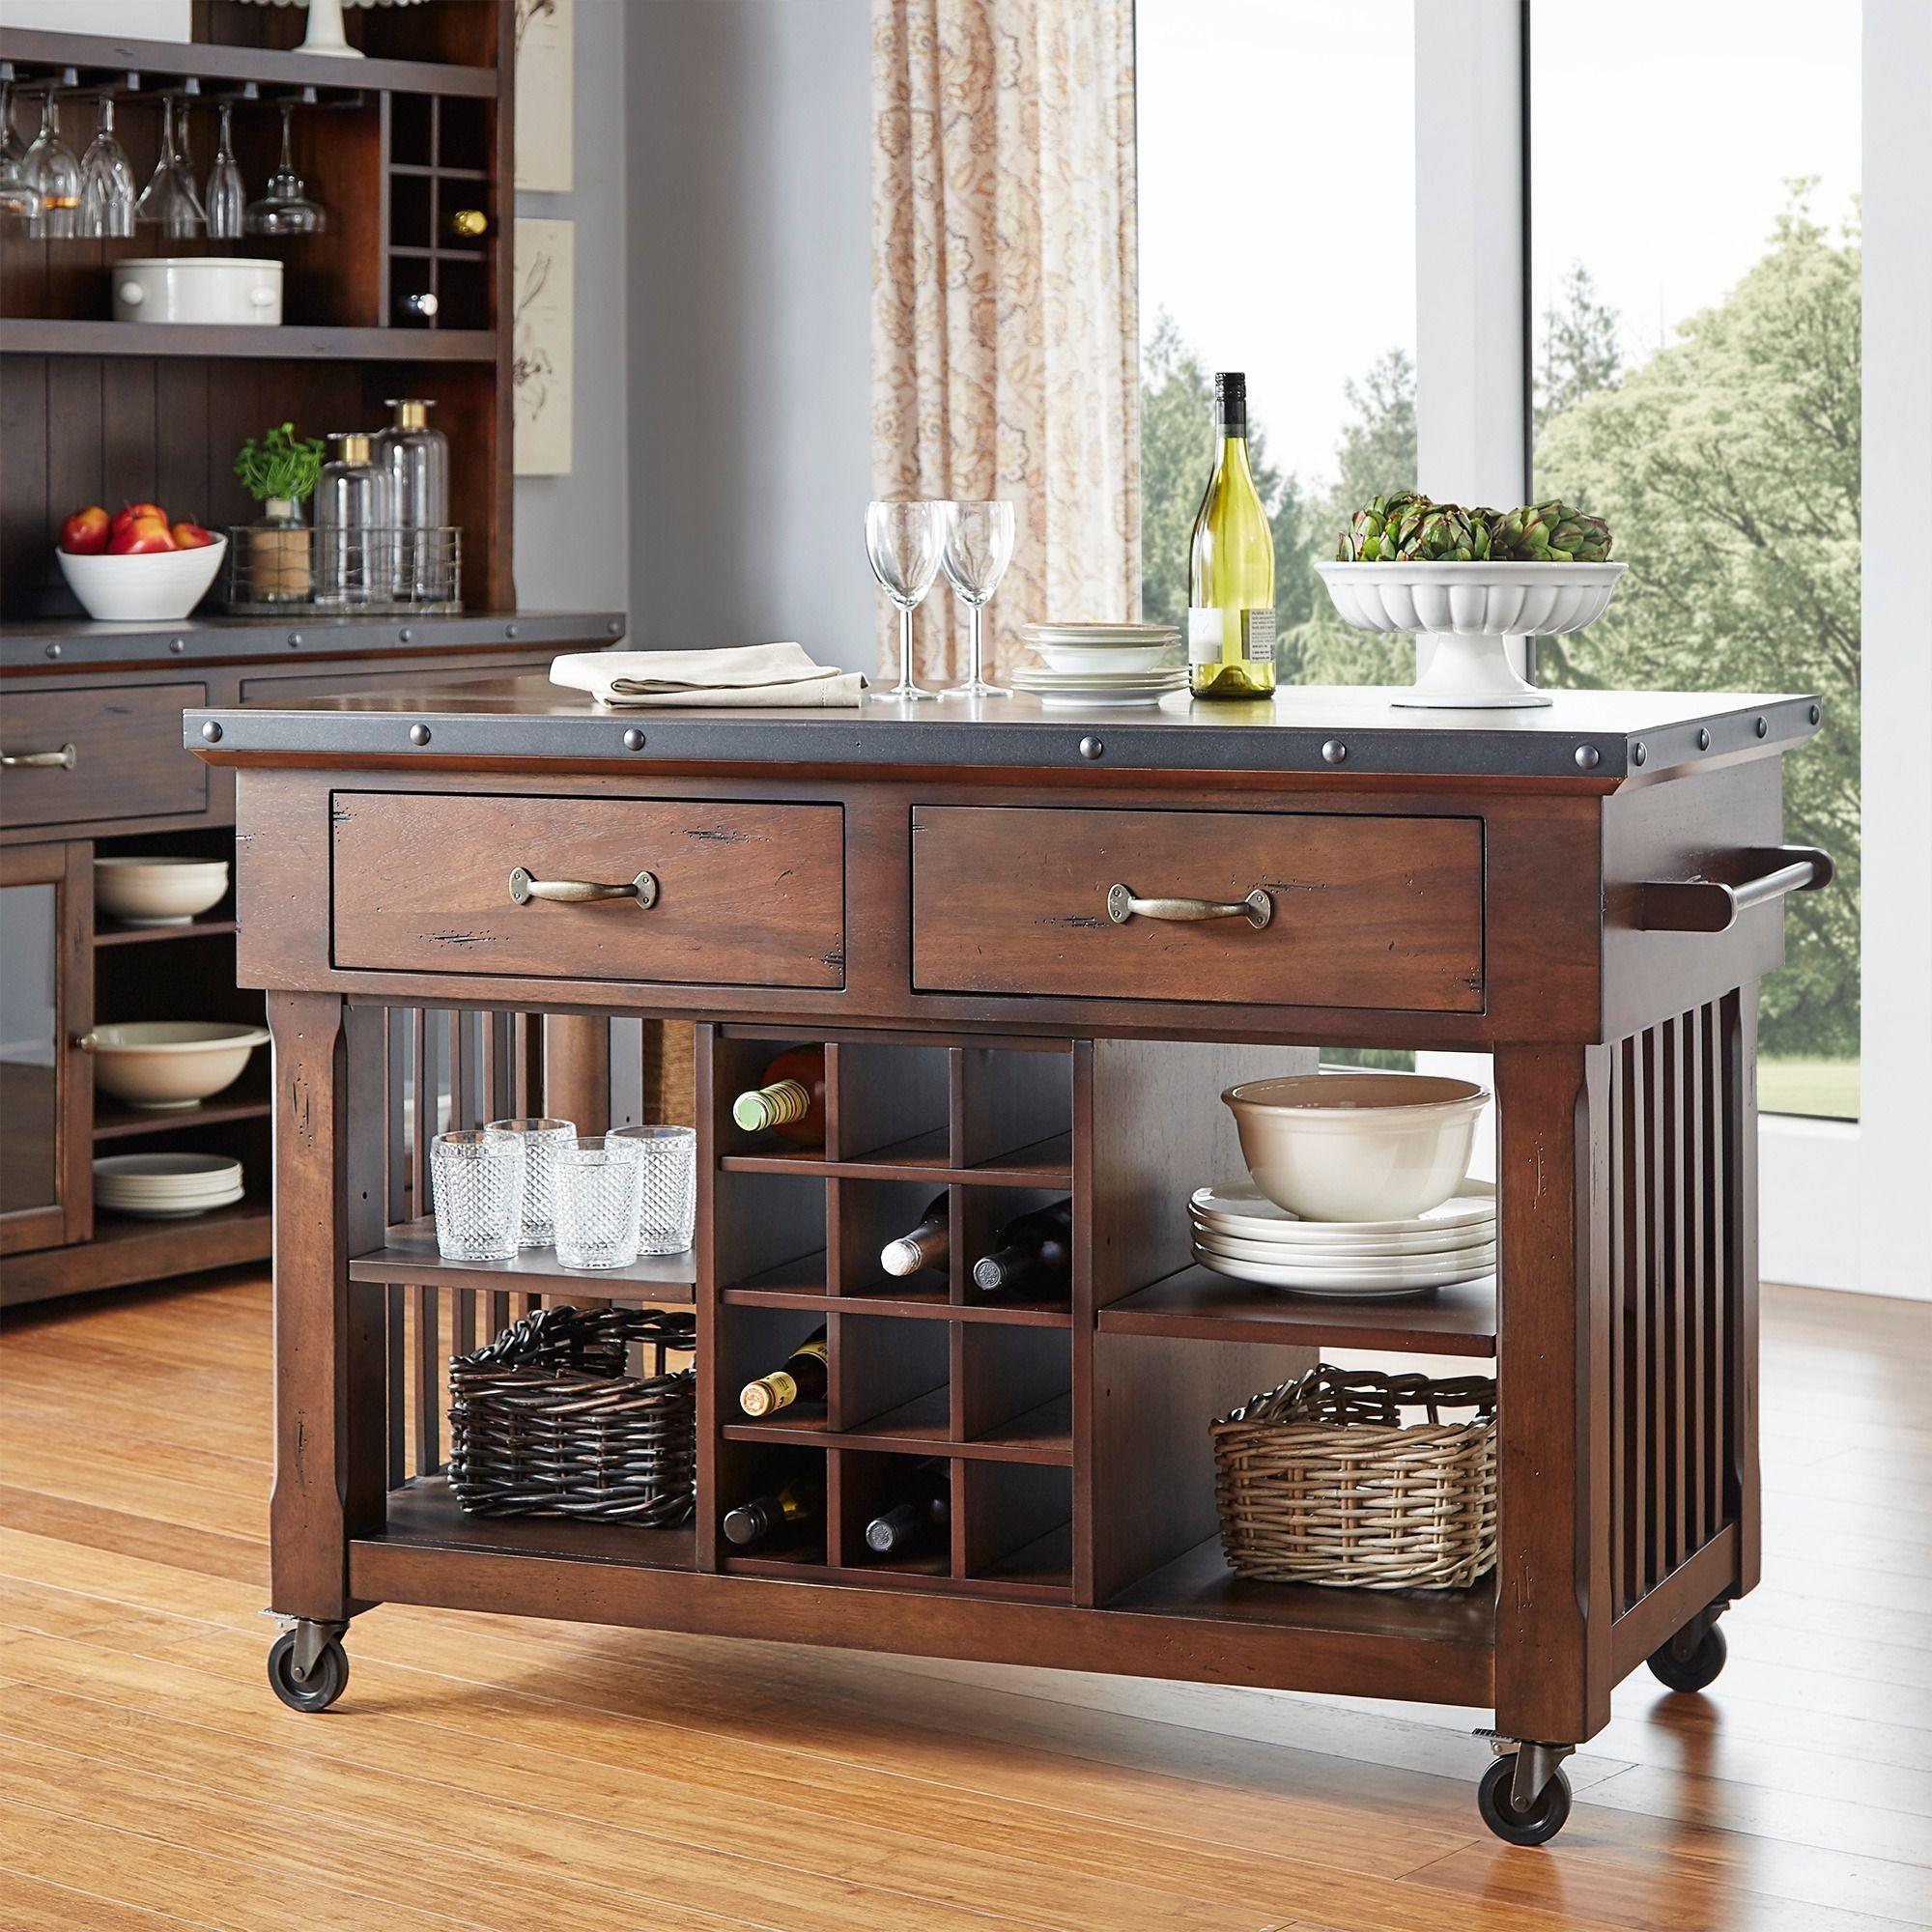 Roots Rack Kitchen Cart Pine: Norwood 2-drawer Kitchen Cart With Wine Rack (Kitchen Cart